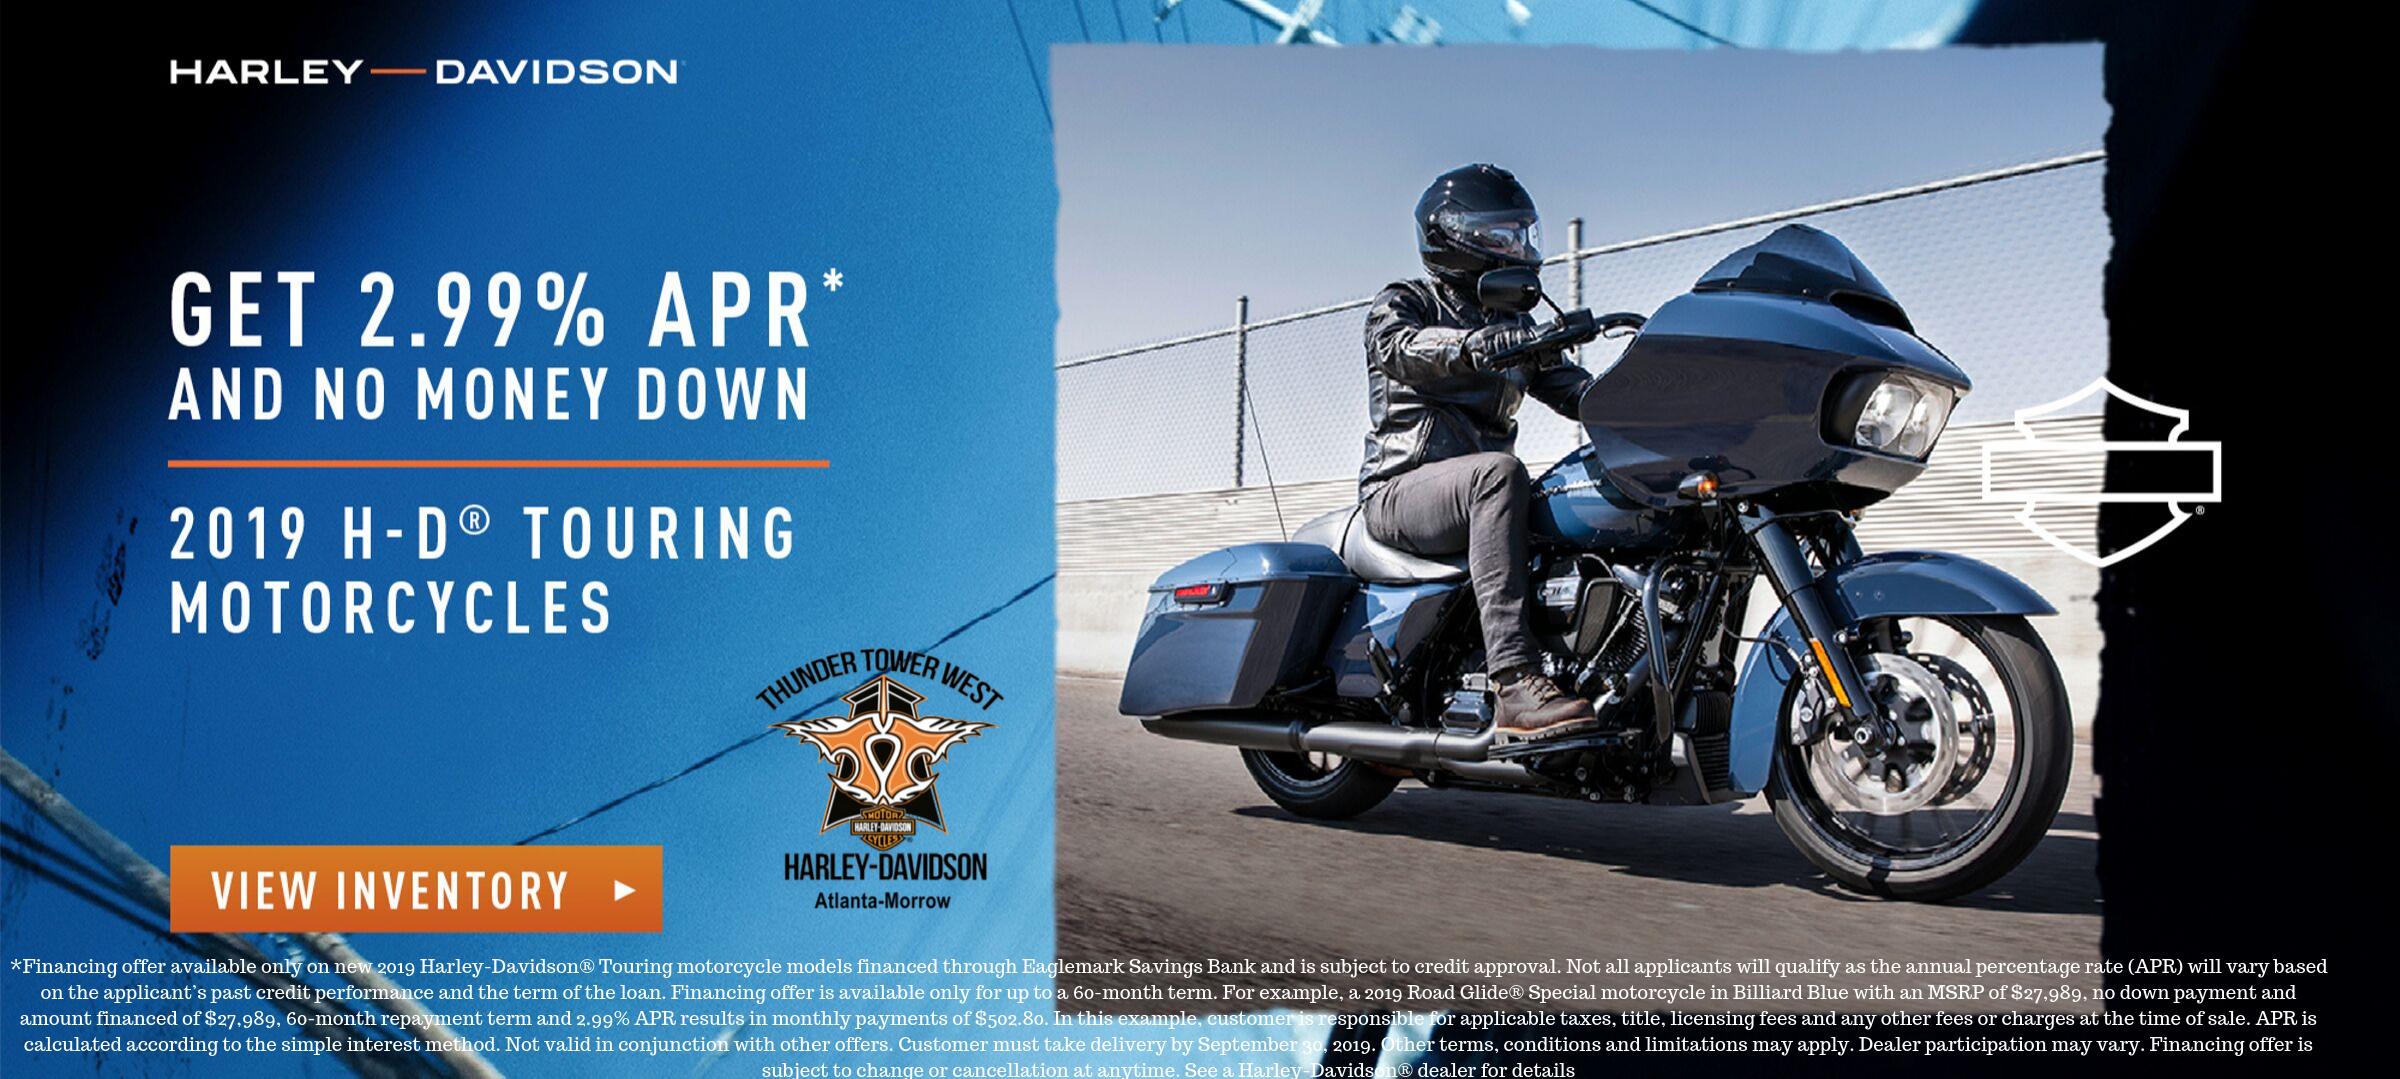 Atlanta Harley Davidson >> New Used Motorcycle Dealer Thunder Tower West Harley